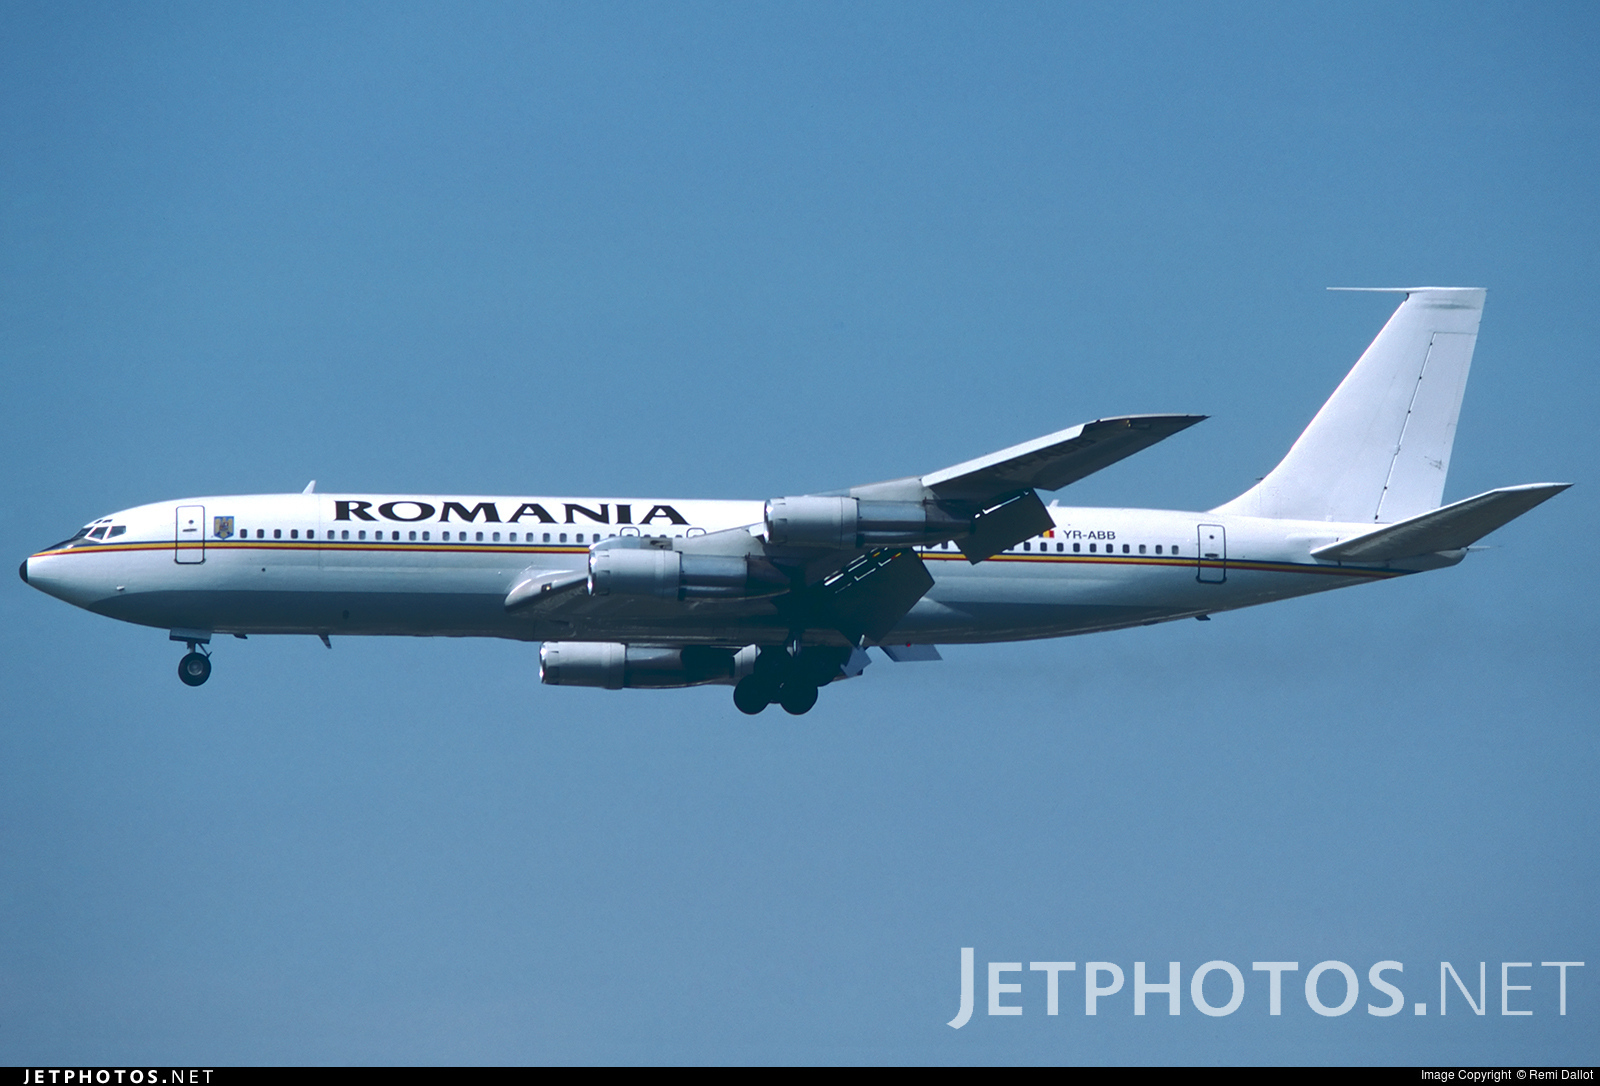 YR-ABB - Boeing 707-3K1C - Romania - Government